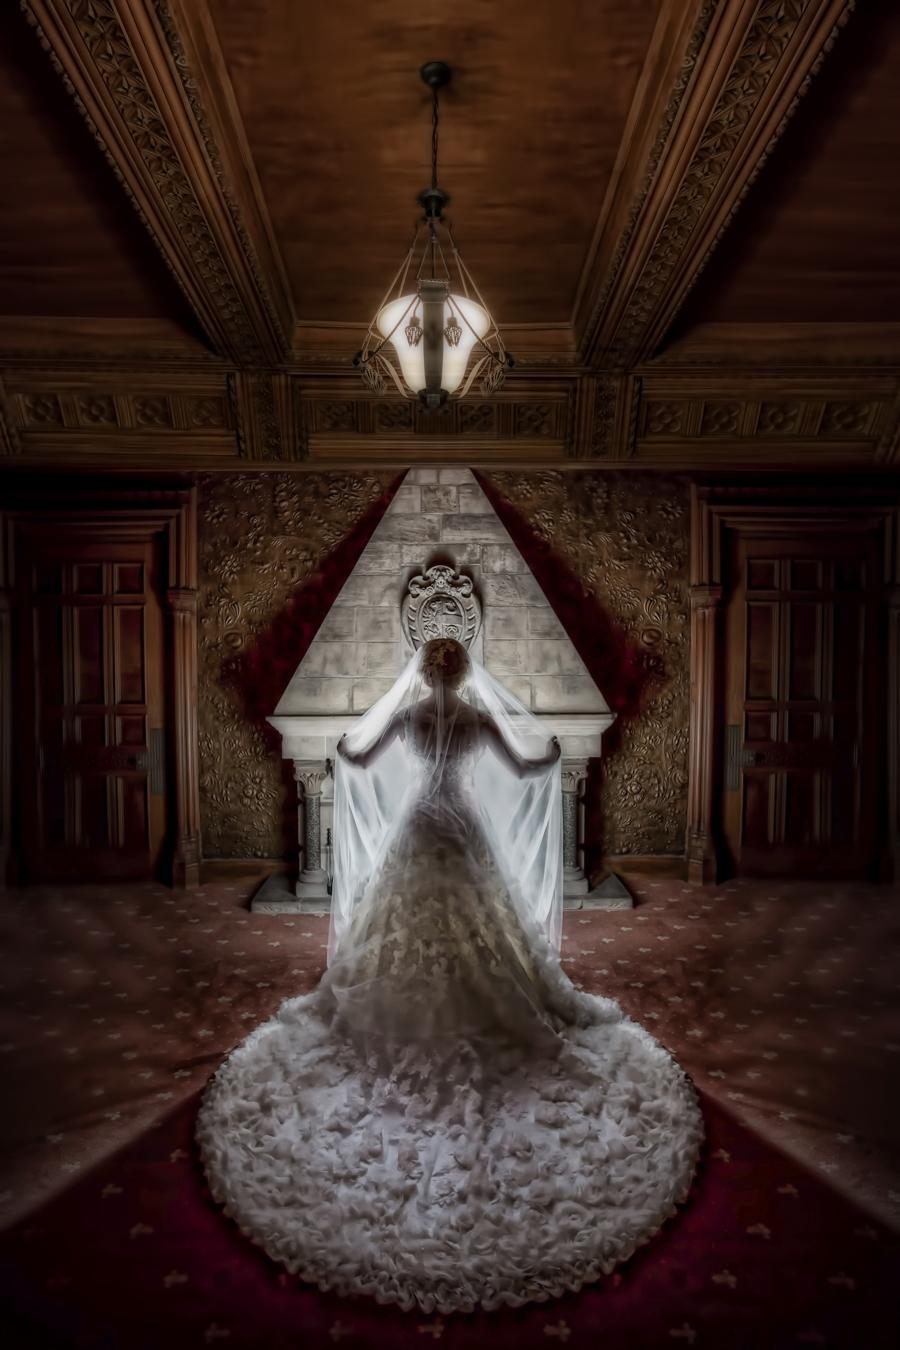 Winter wedding photography training. Courses for winter weddings. Hazlewood Castle wedding photography